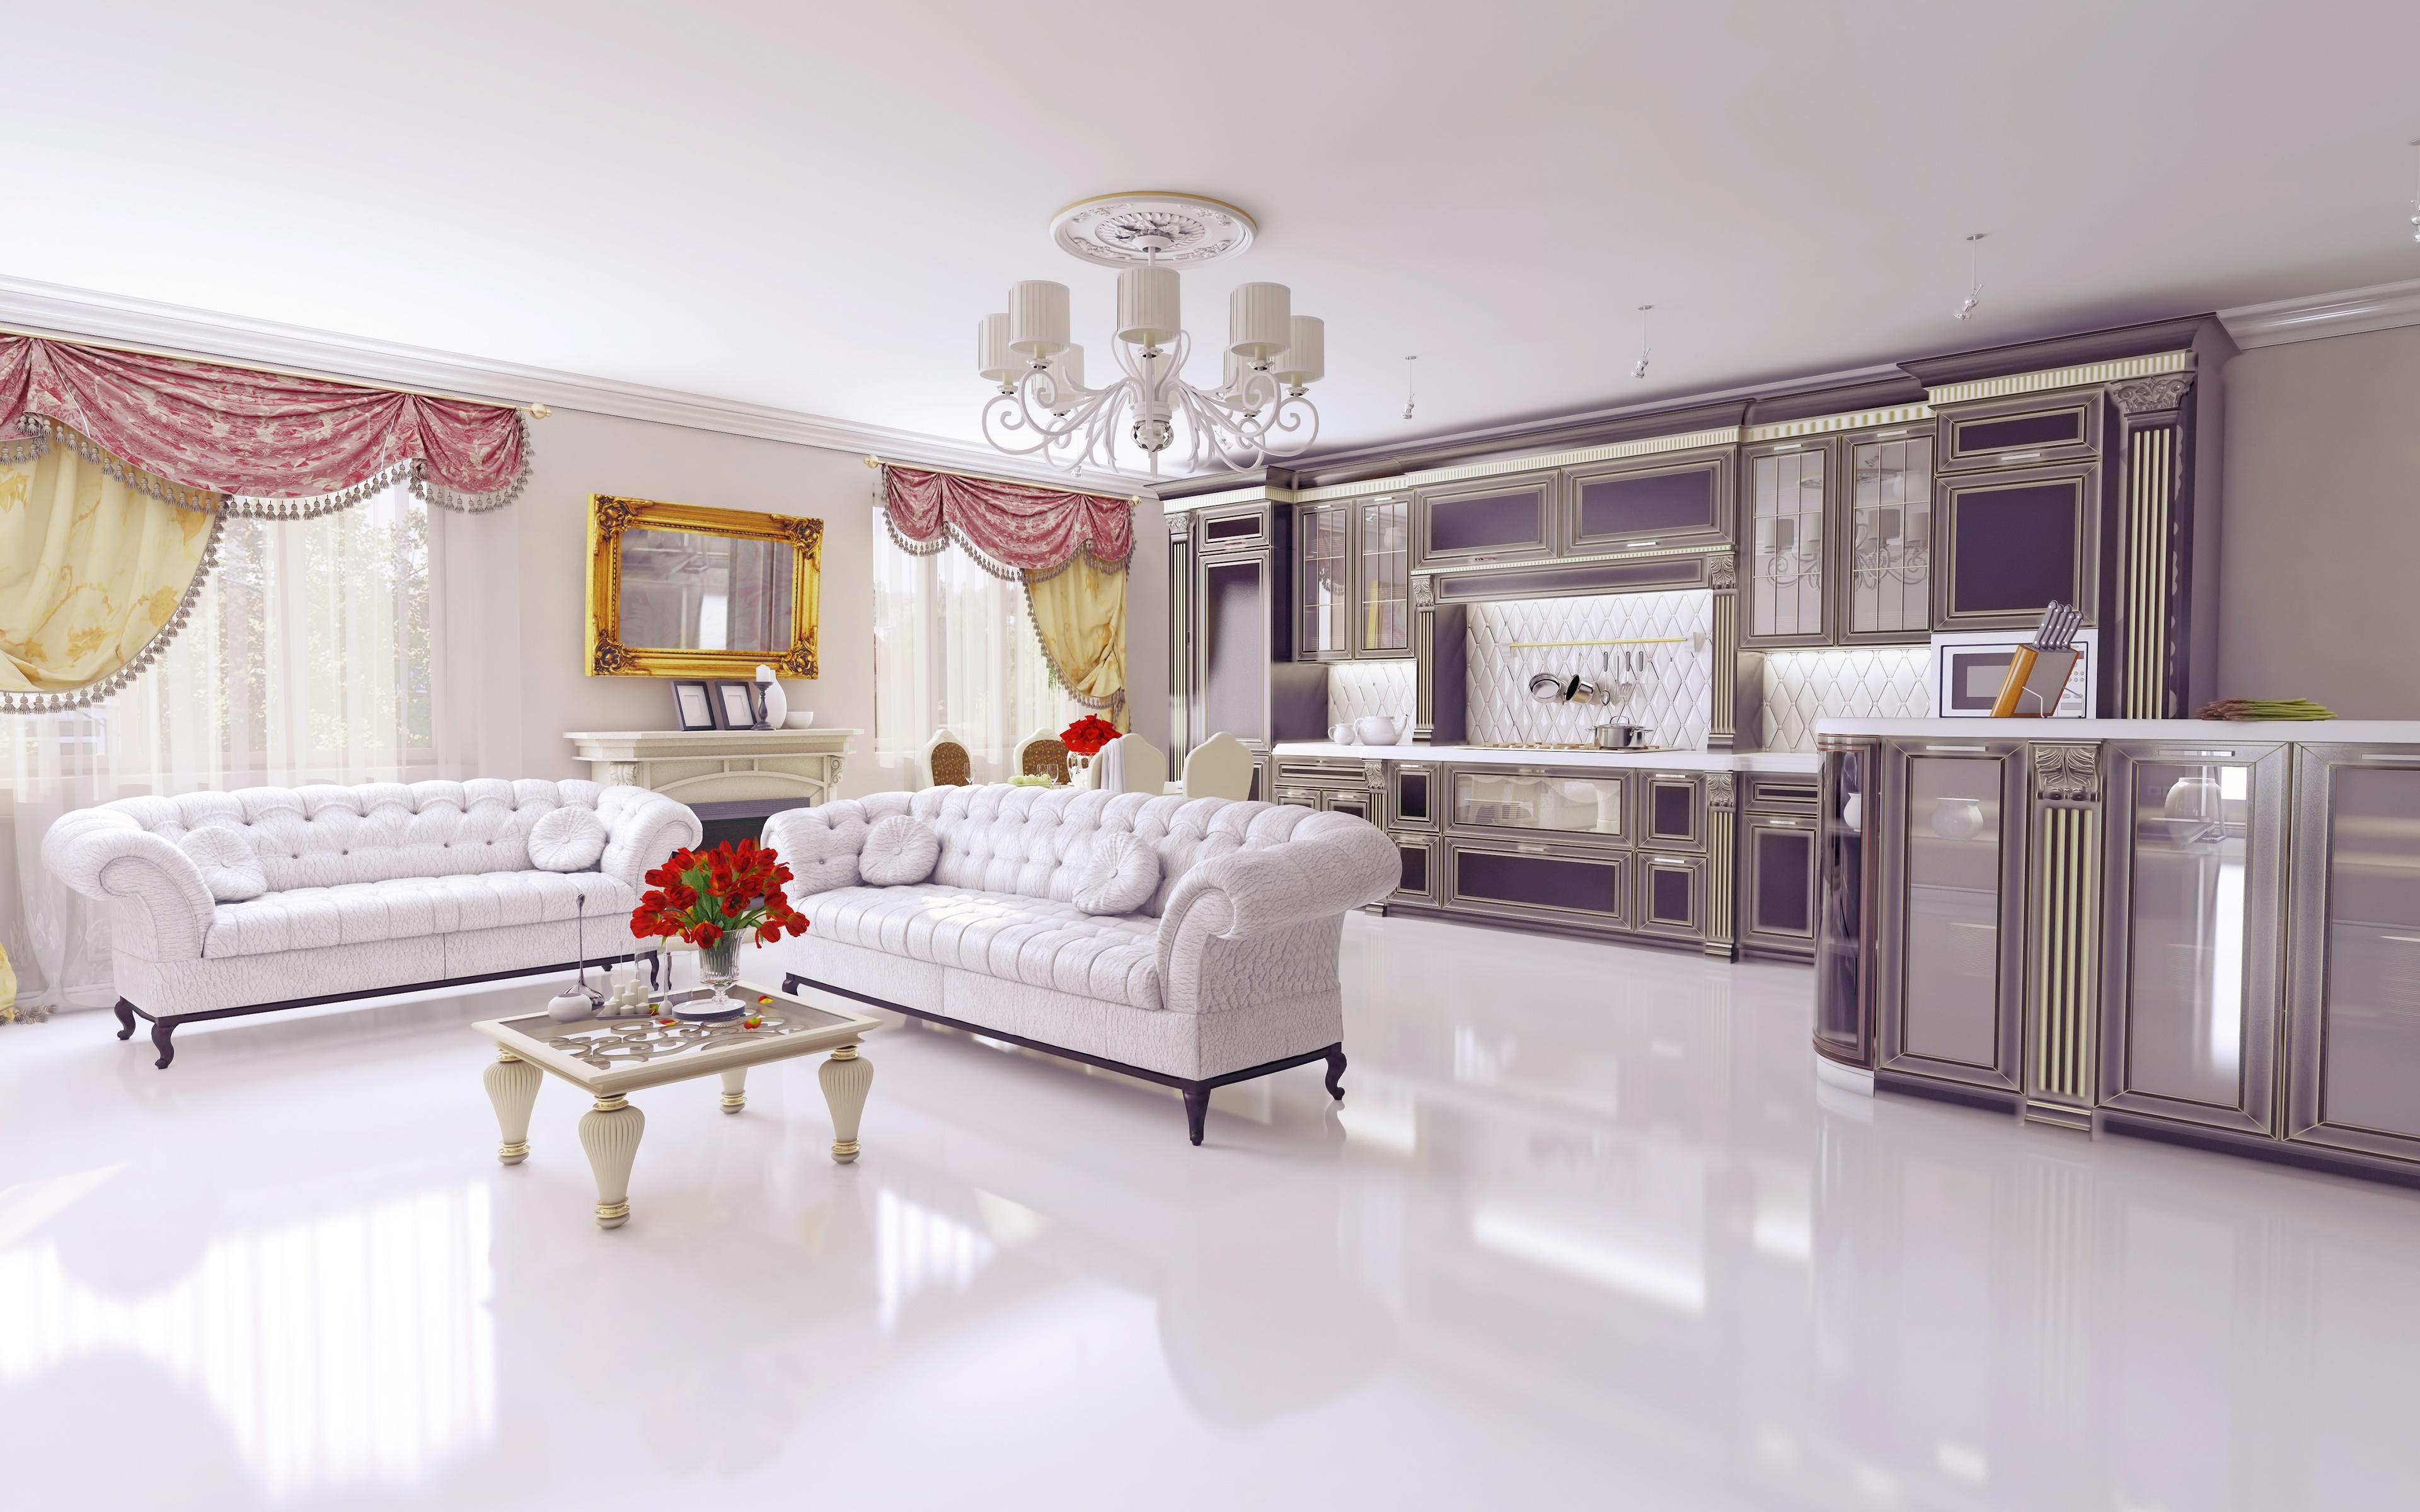 Chandelier Furniture Living Room Room Sofa 3840x2400